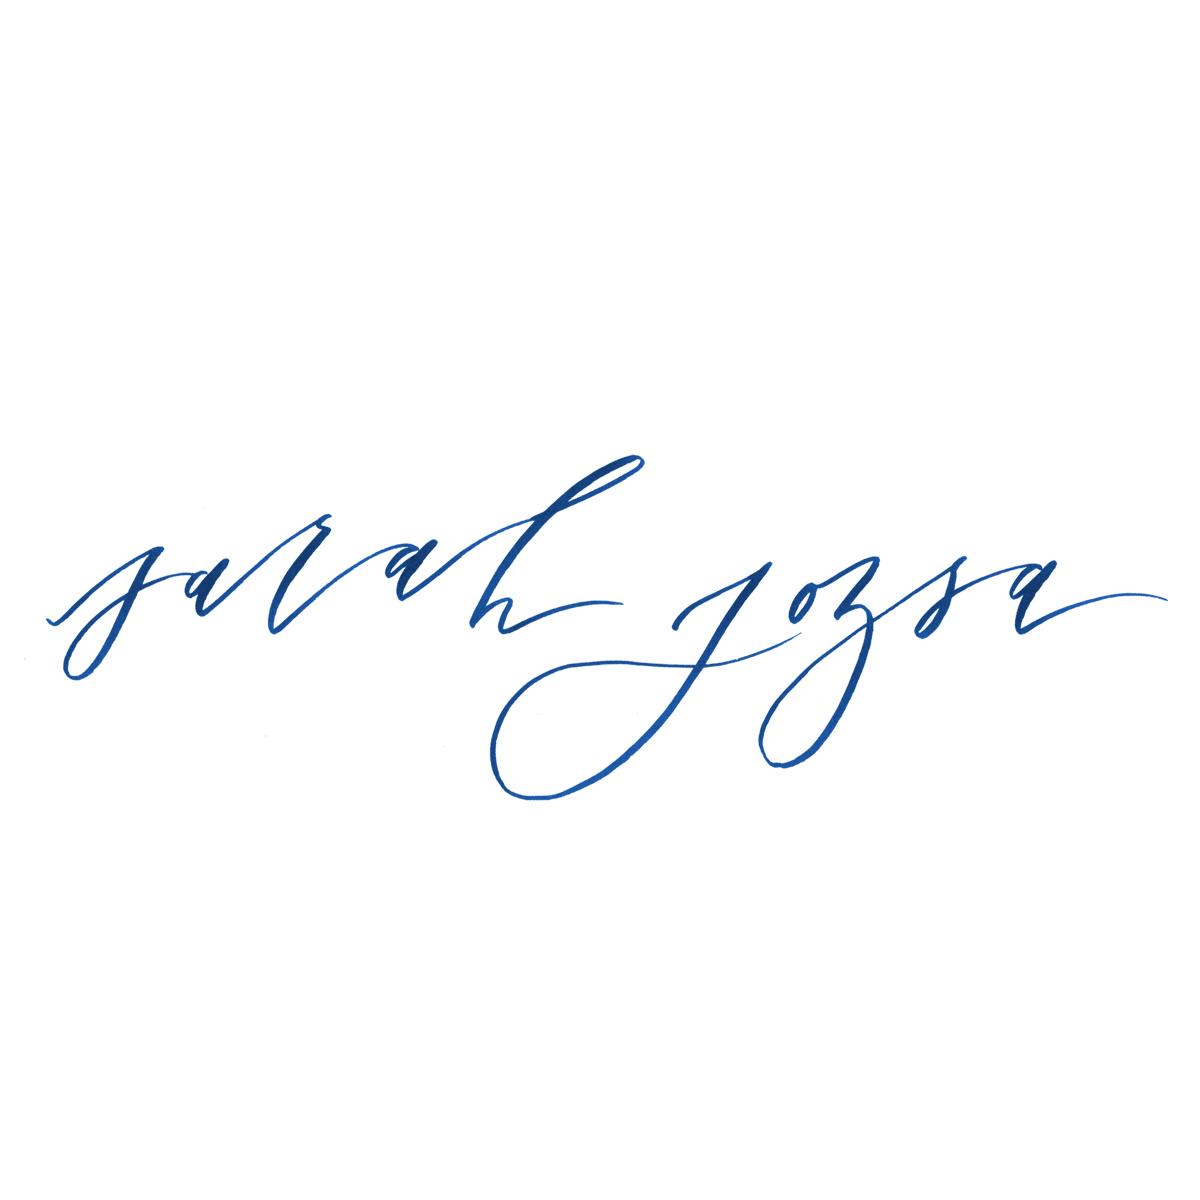 Sara Jozsa hand-lettered logo